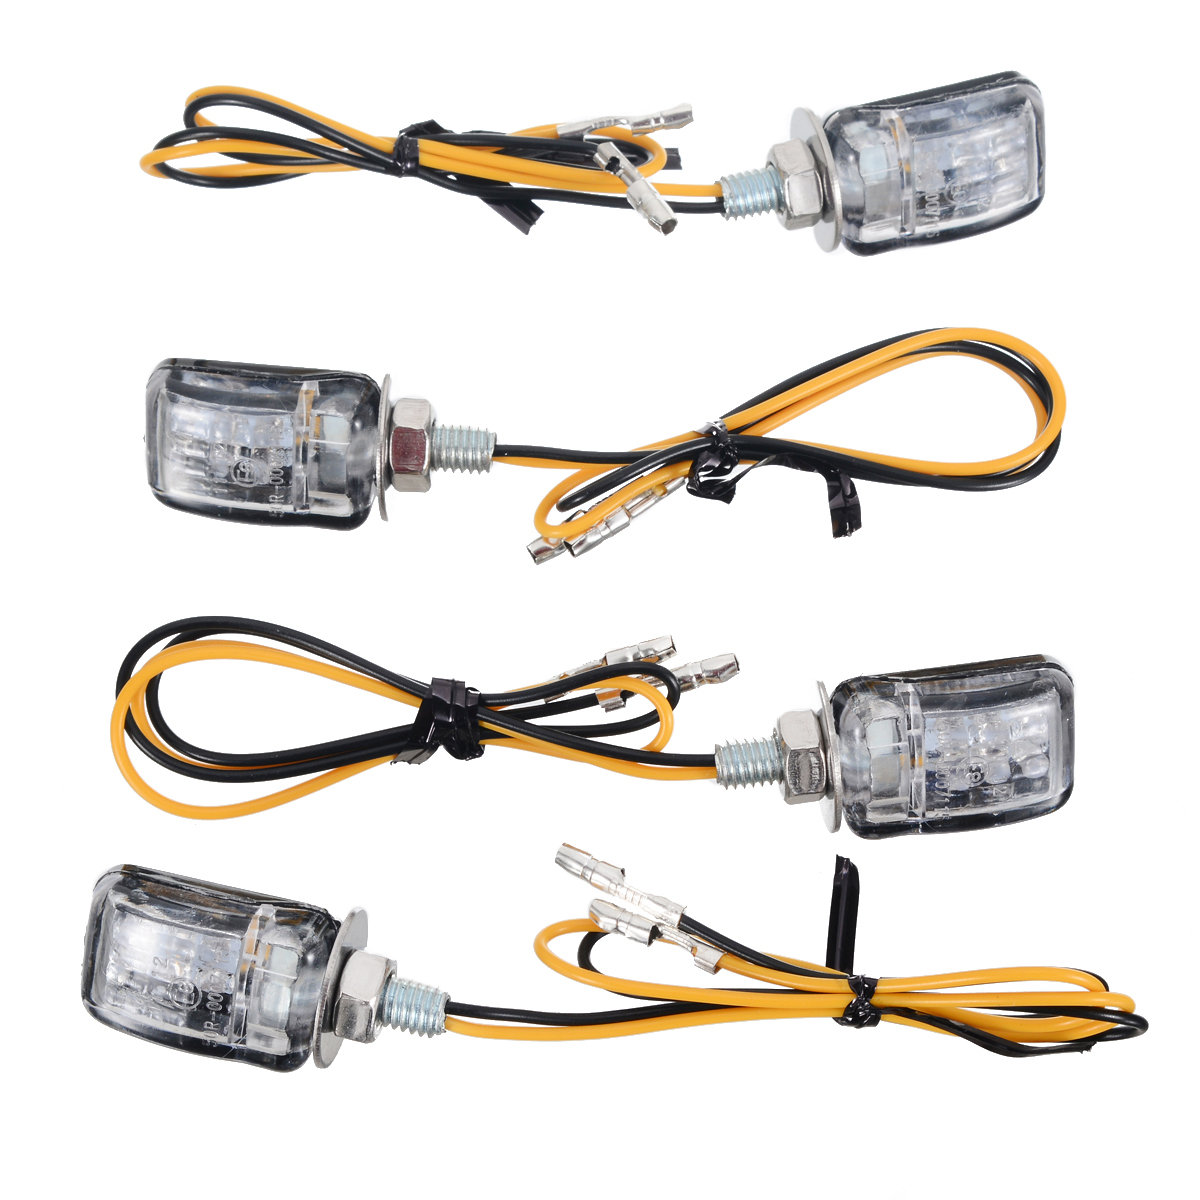 4pcs Amber LED Motorcycle Dirt Bike Mini Turn Signal Indicator Light Blinker 27 x 17 5 x 19mm Lamp Black shell For Honda